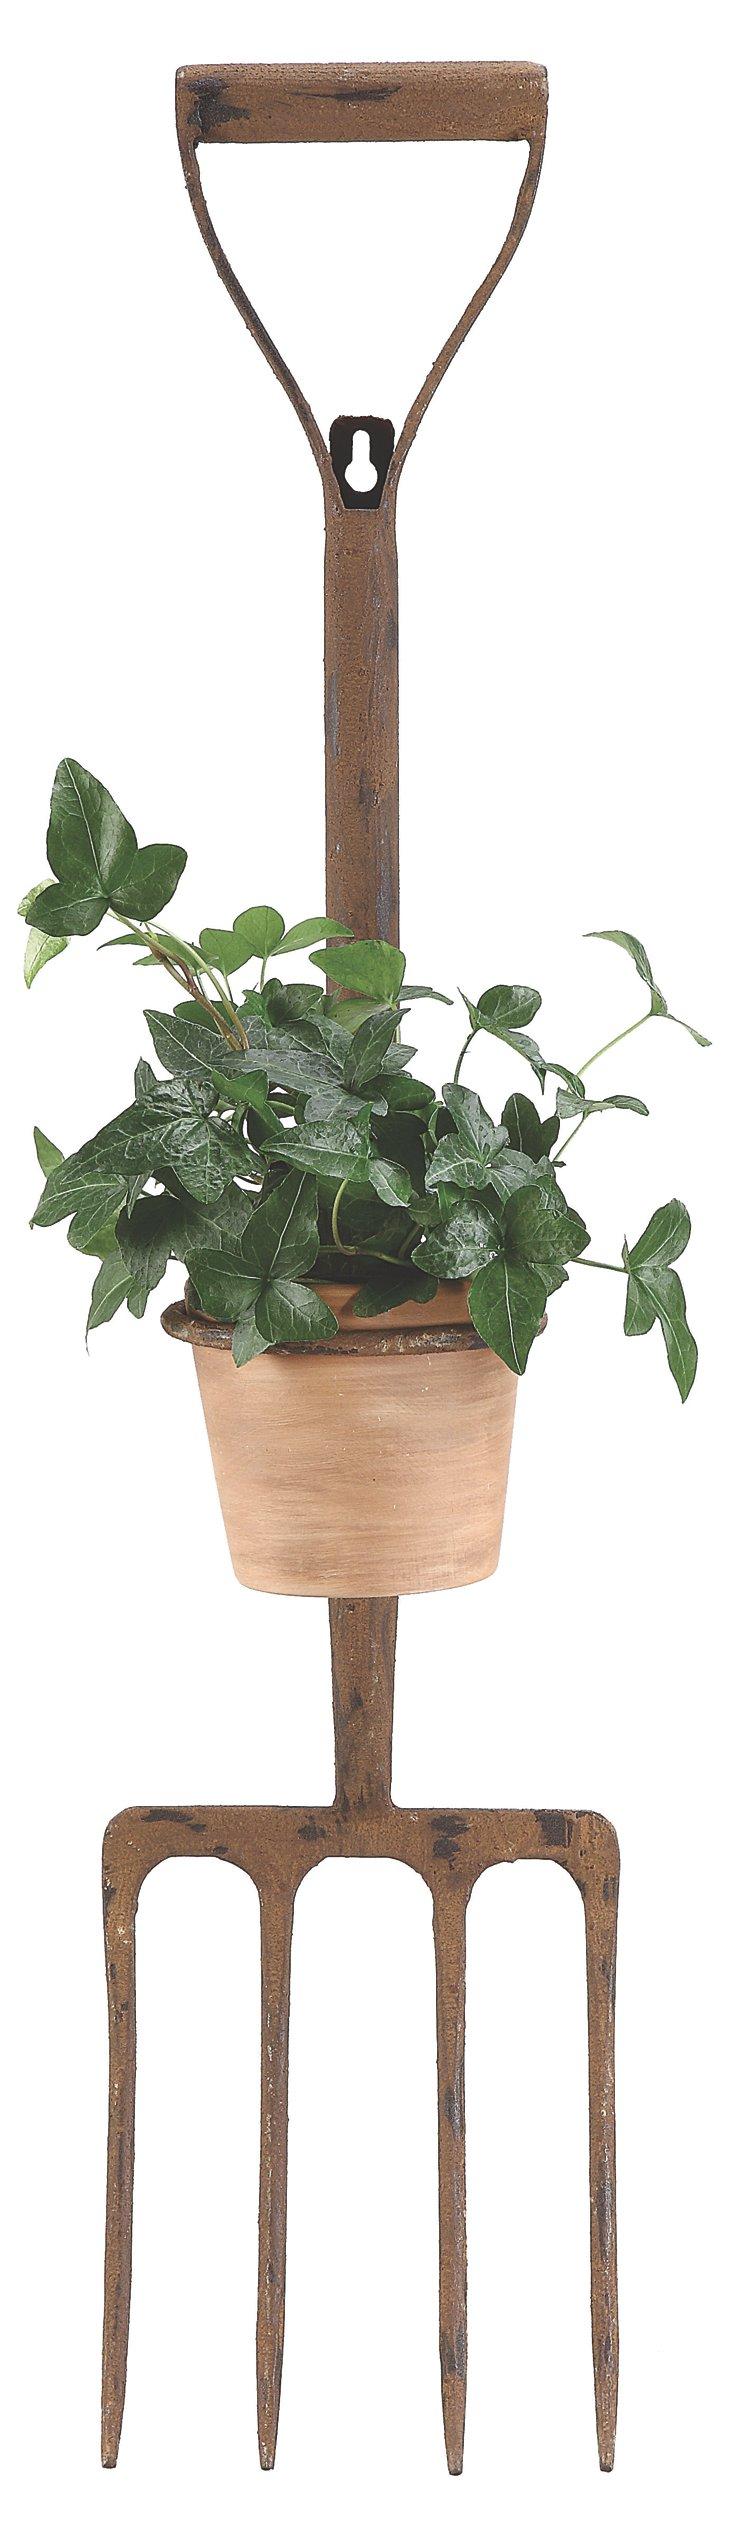 Terracotta Pitchfork Planter